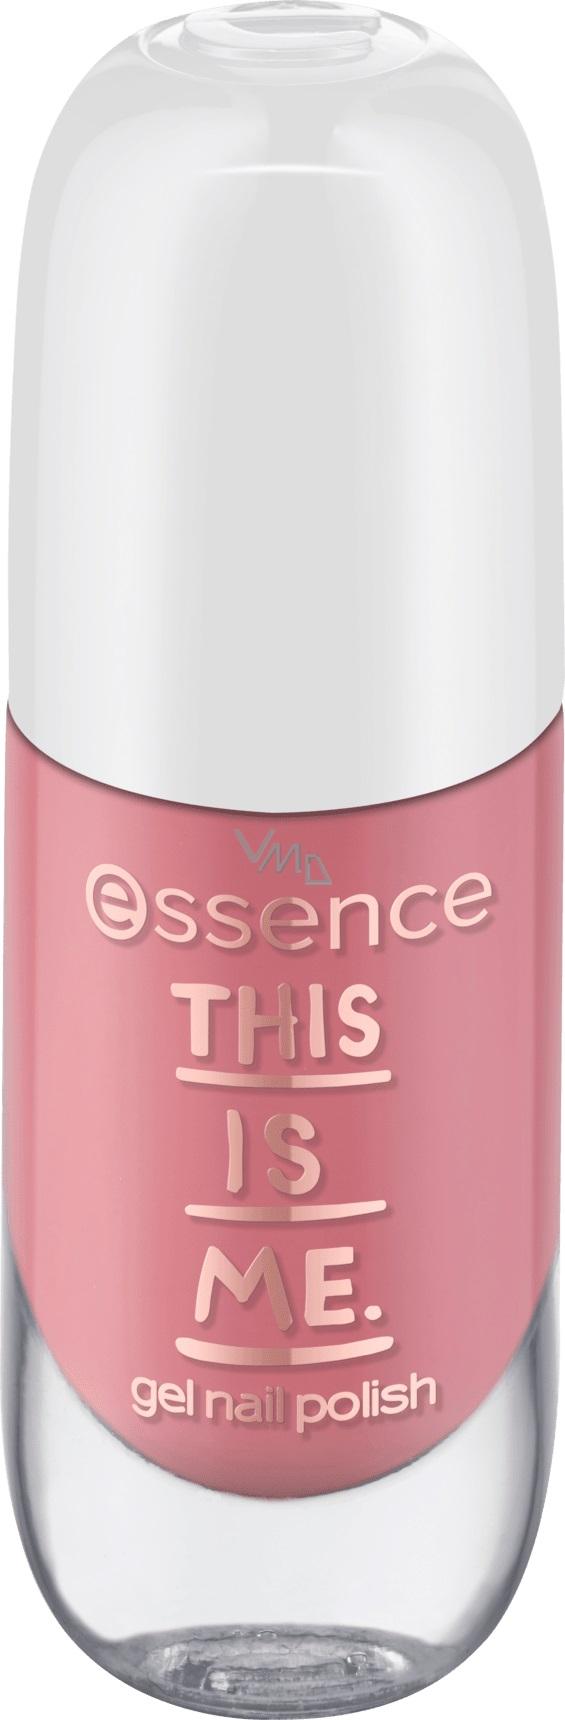 Essence This Is Me Gel Nail Polish Gelovy Lak Na Nehty 01 Freaky 8 Ml Vmd Drogerie A Parfumerie